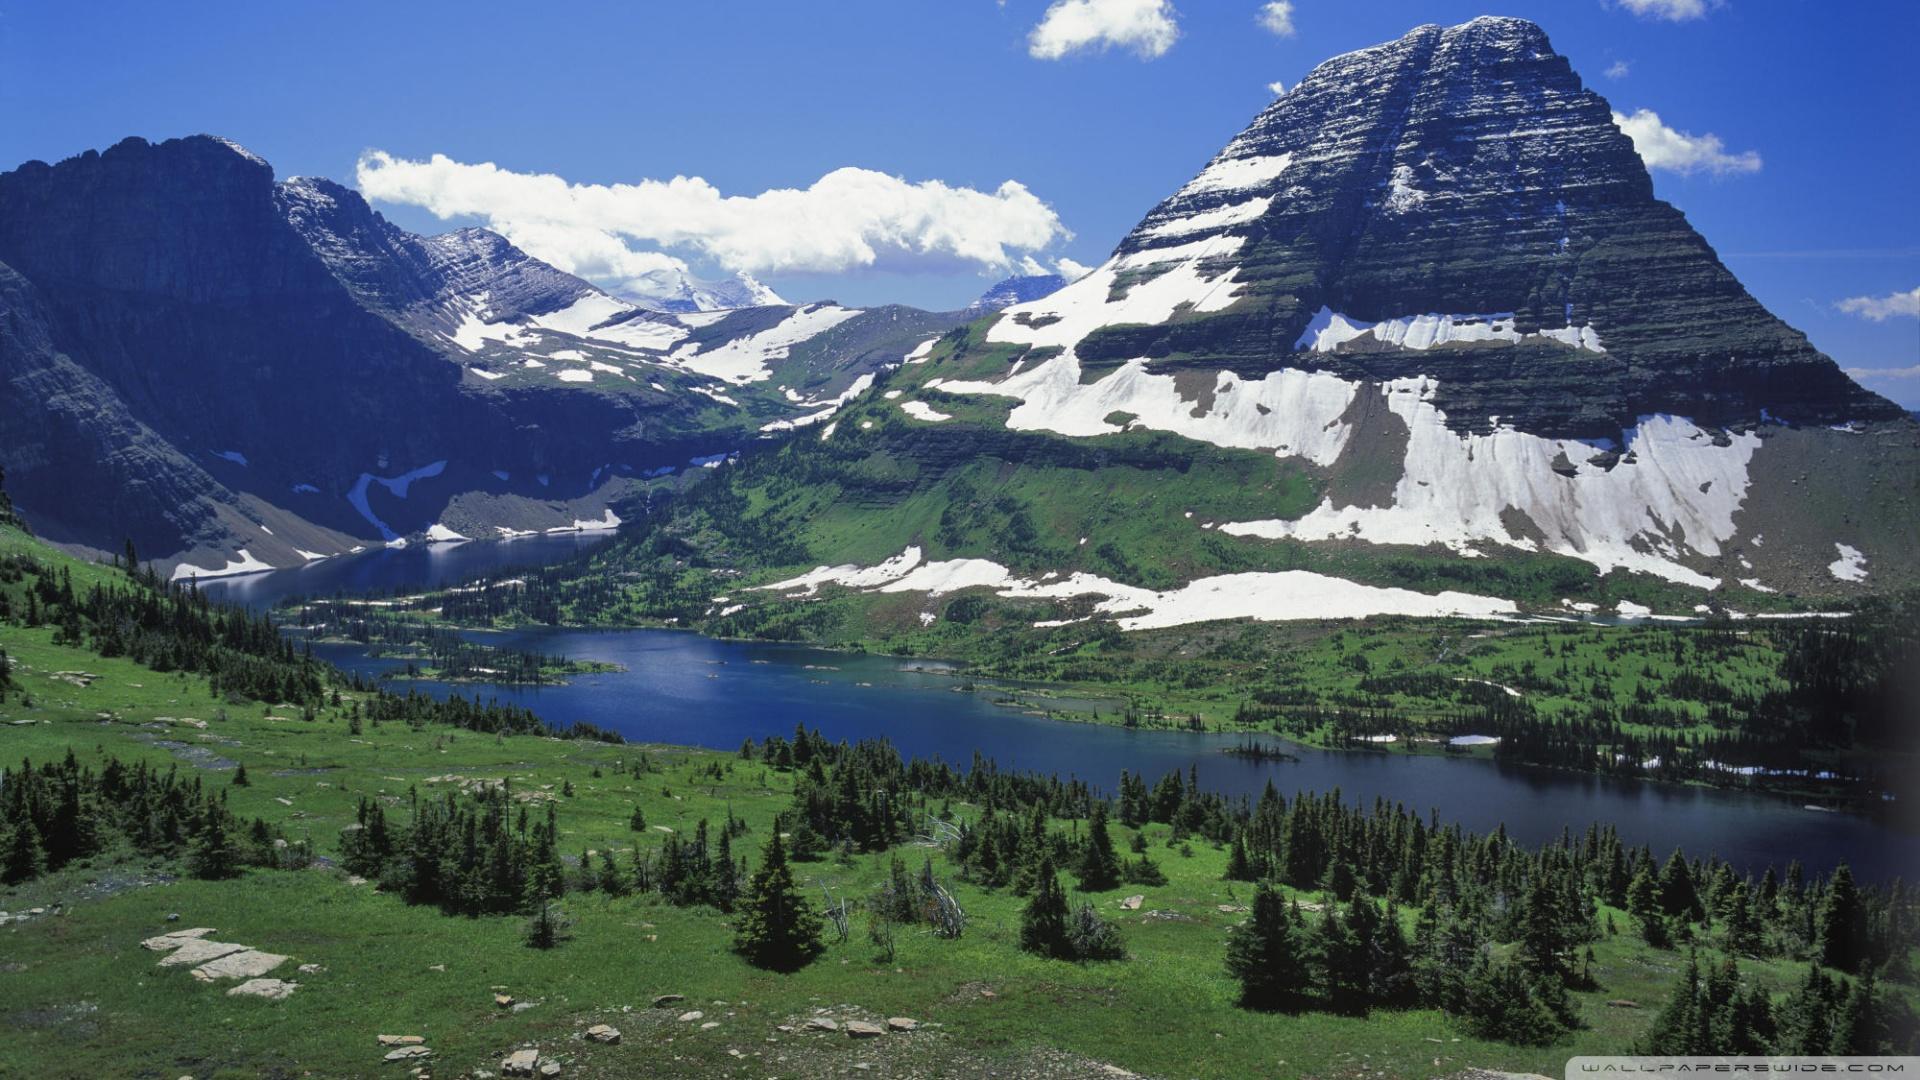 Download Hidden Lake Glacier National Park Montana Wallpaper 1920x1080